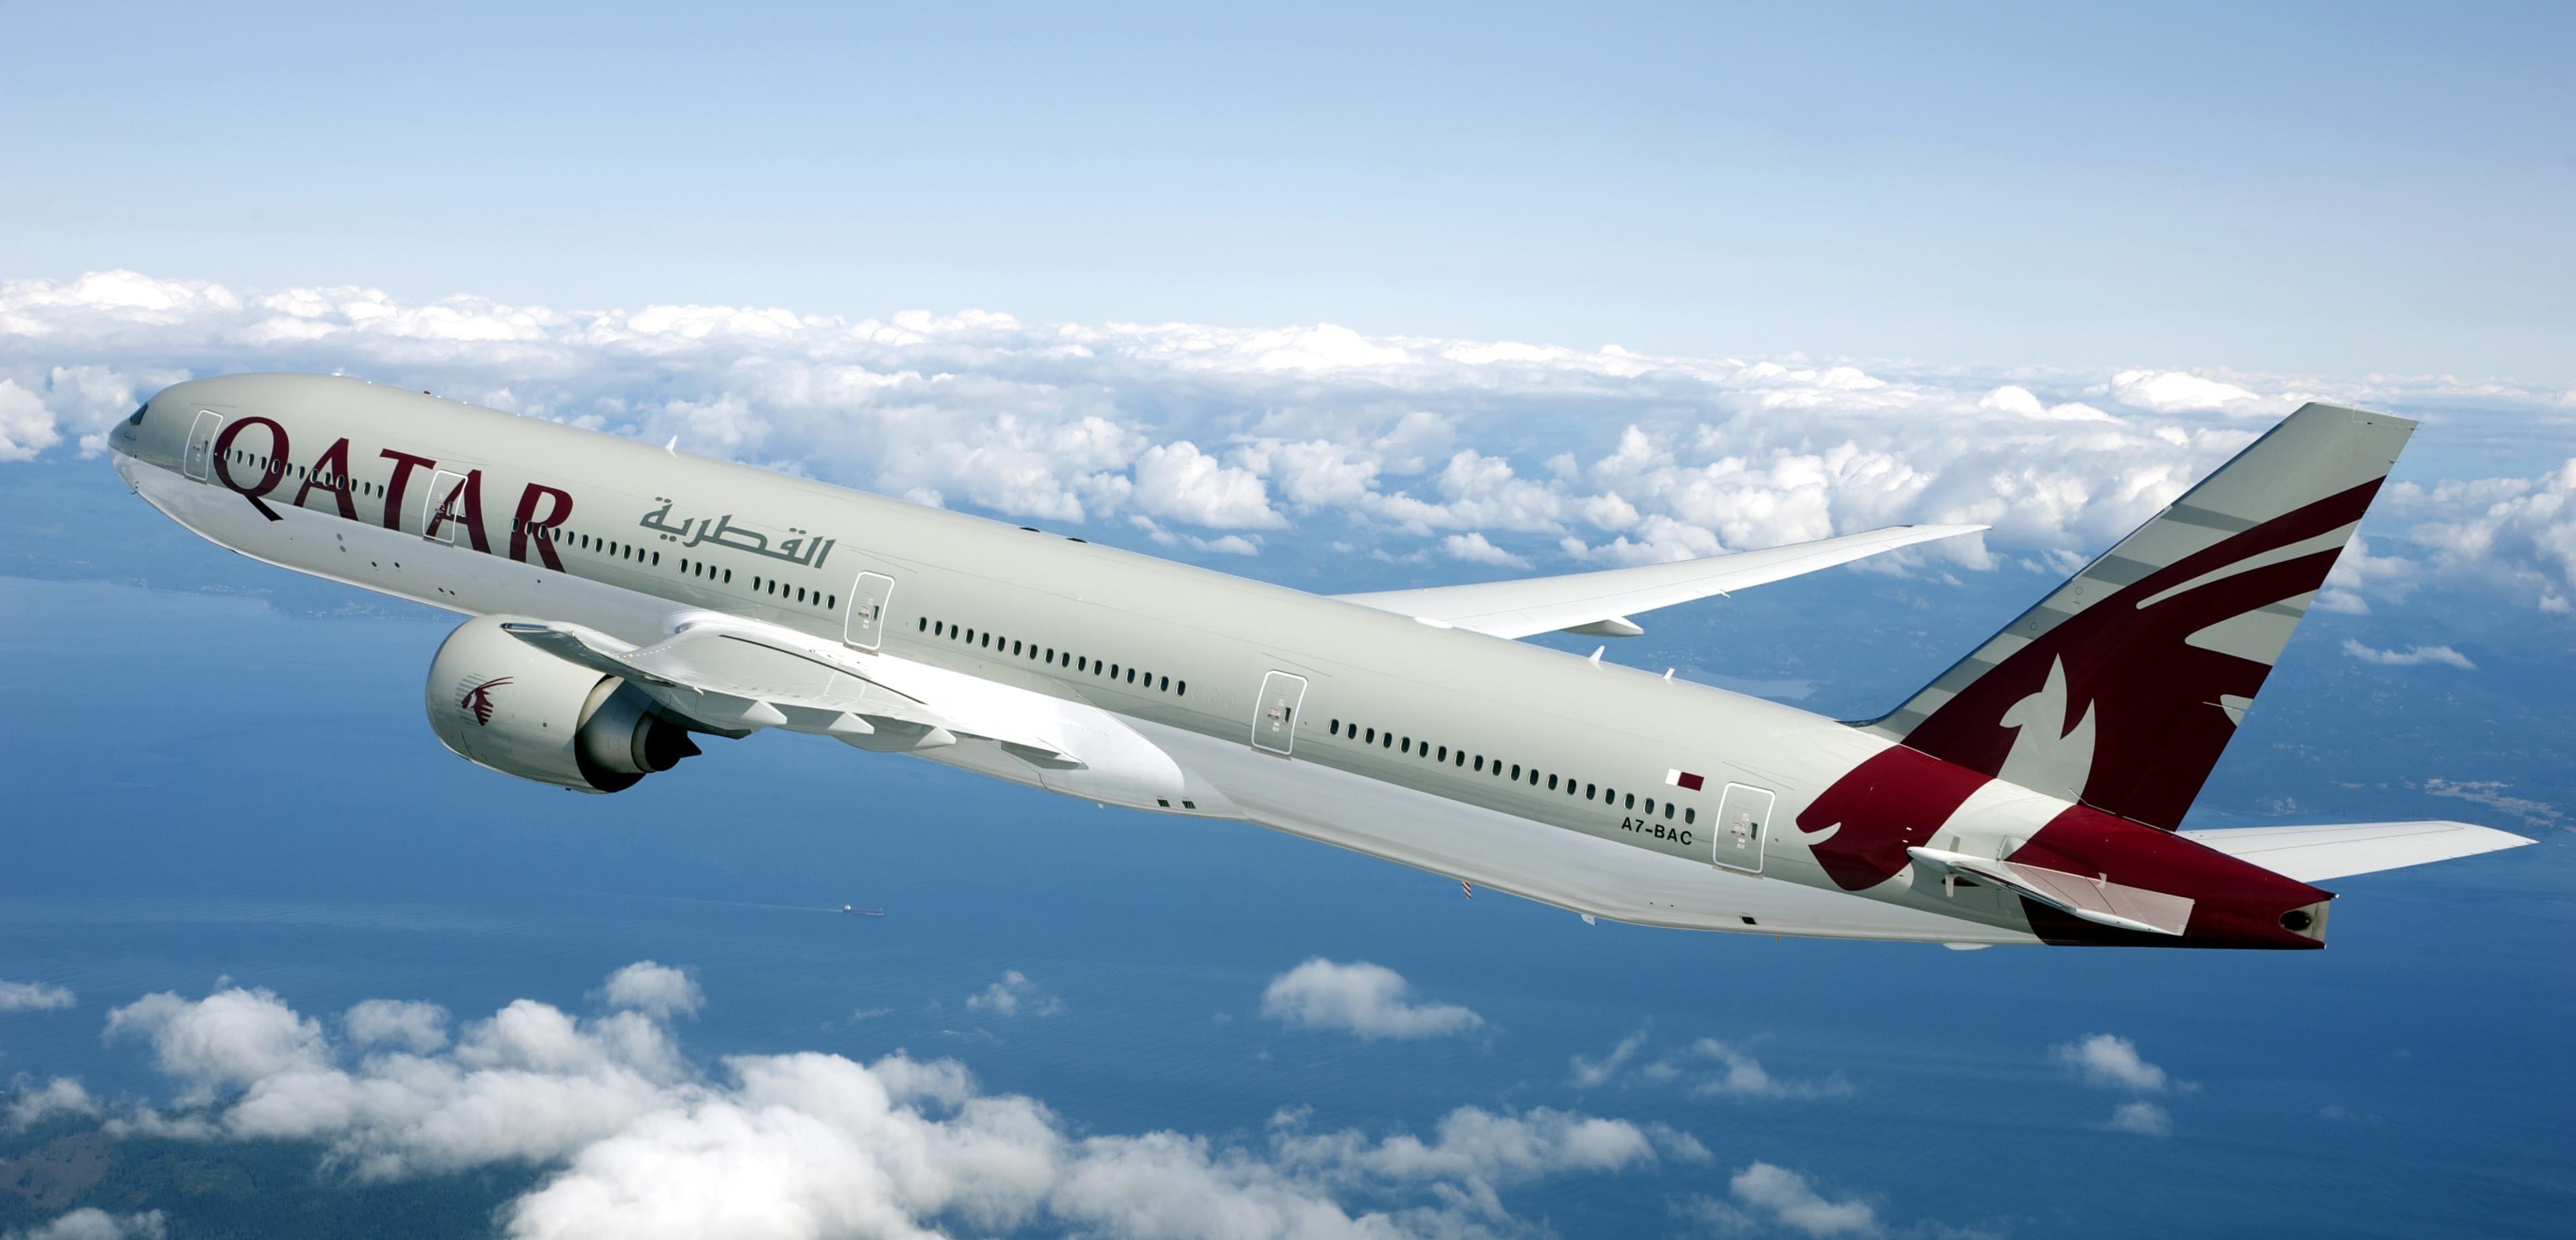 Qatar Airways Careers: Qatar Airways Cabin Crew Recruitment - OFW ...